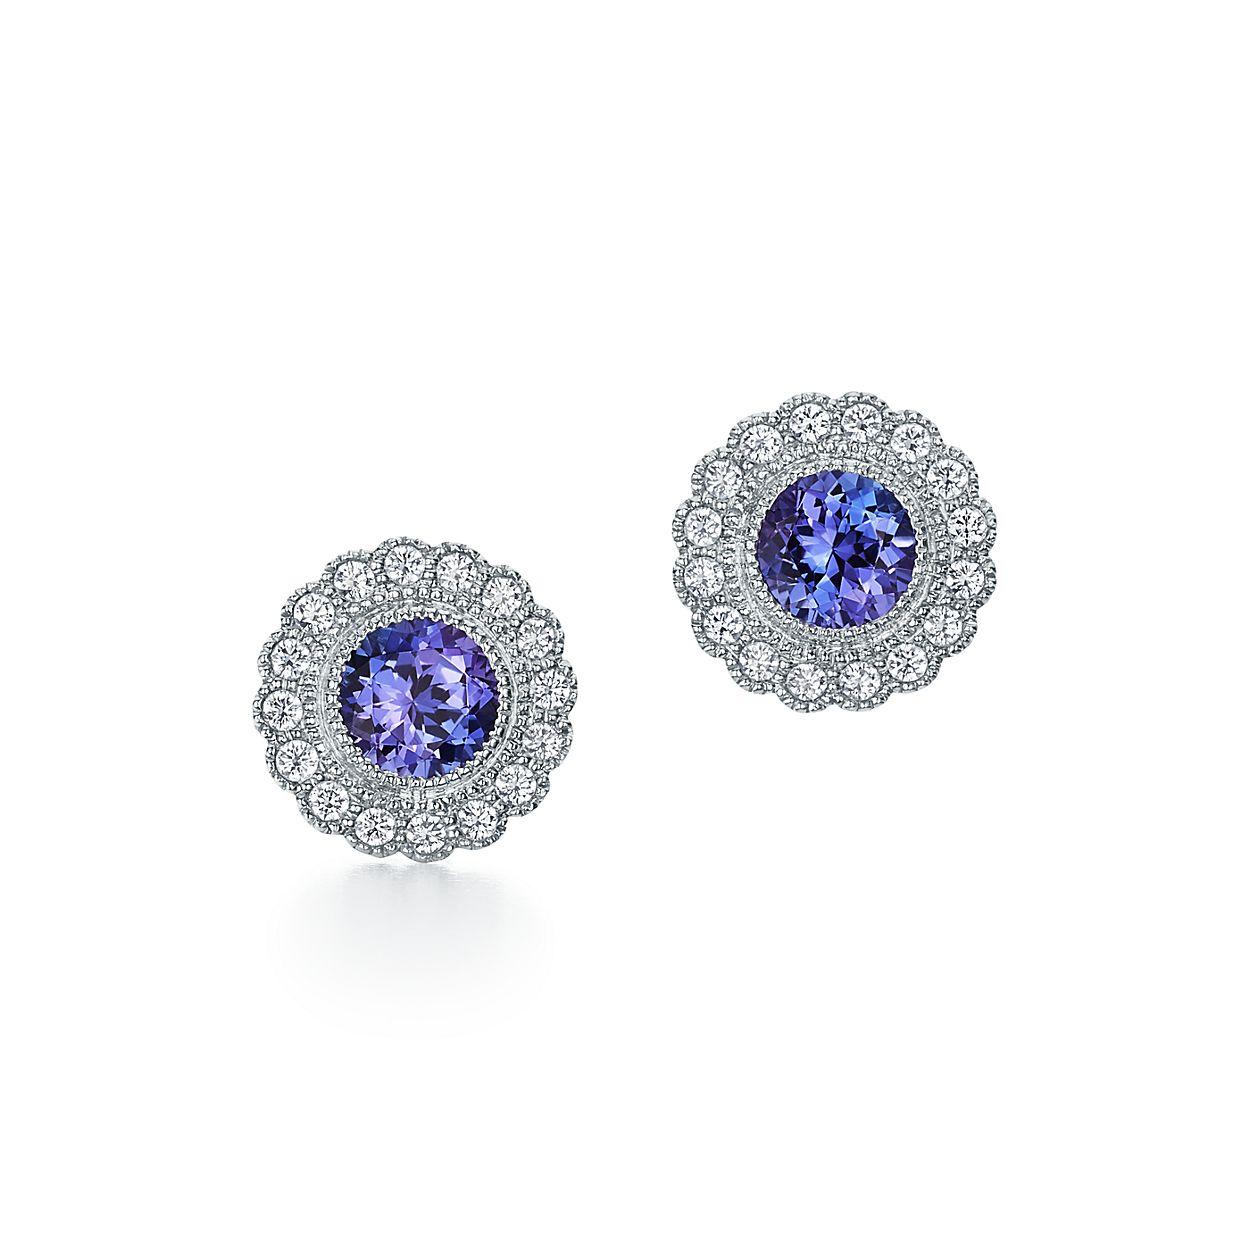 Tiffany Enchant Tanzanite Earrings